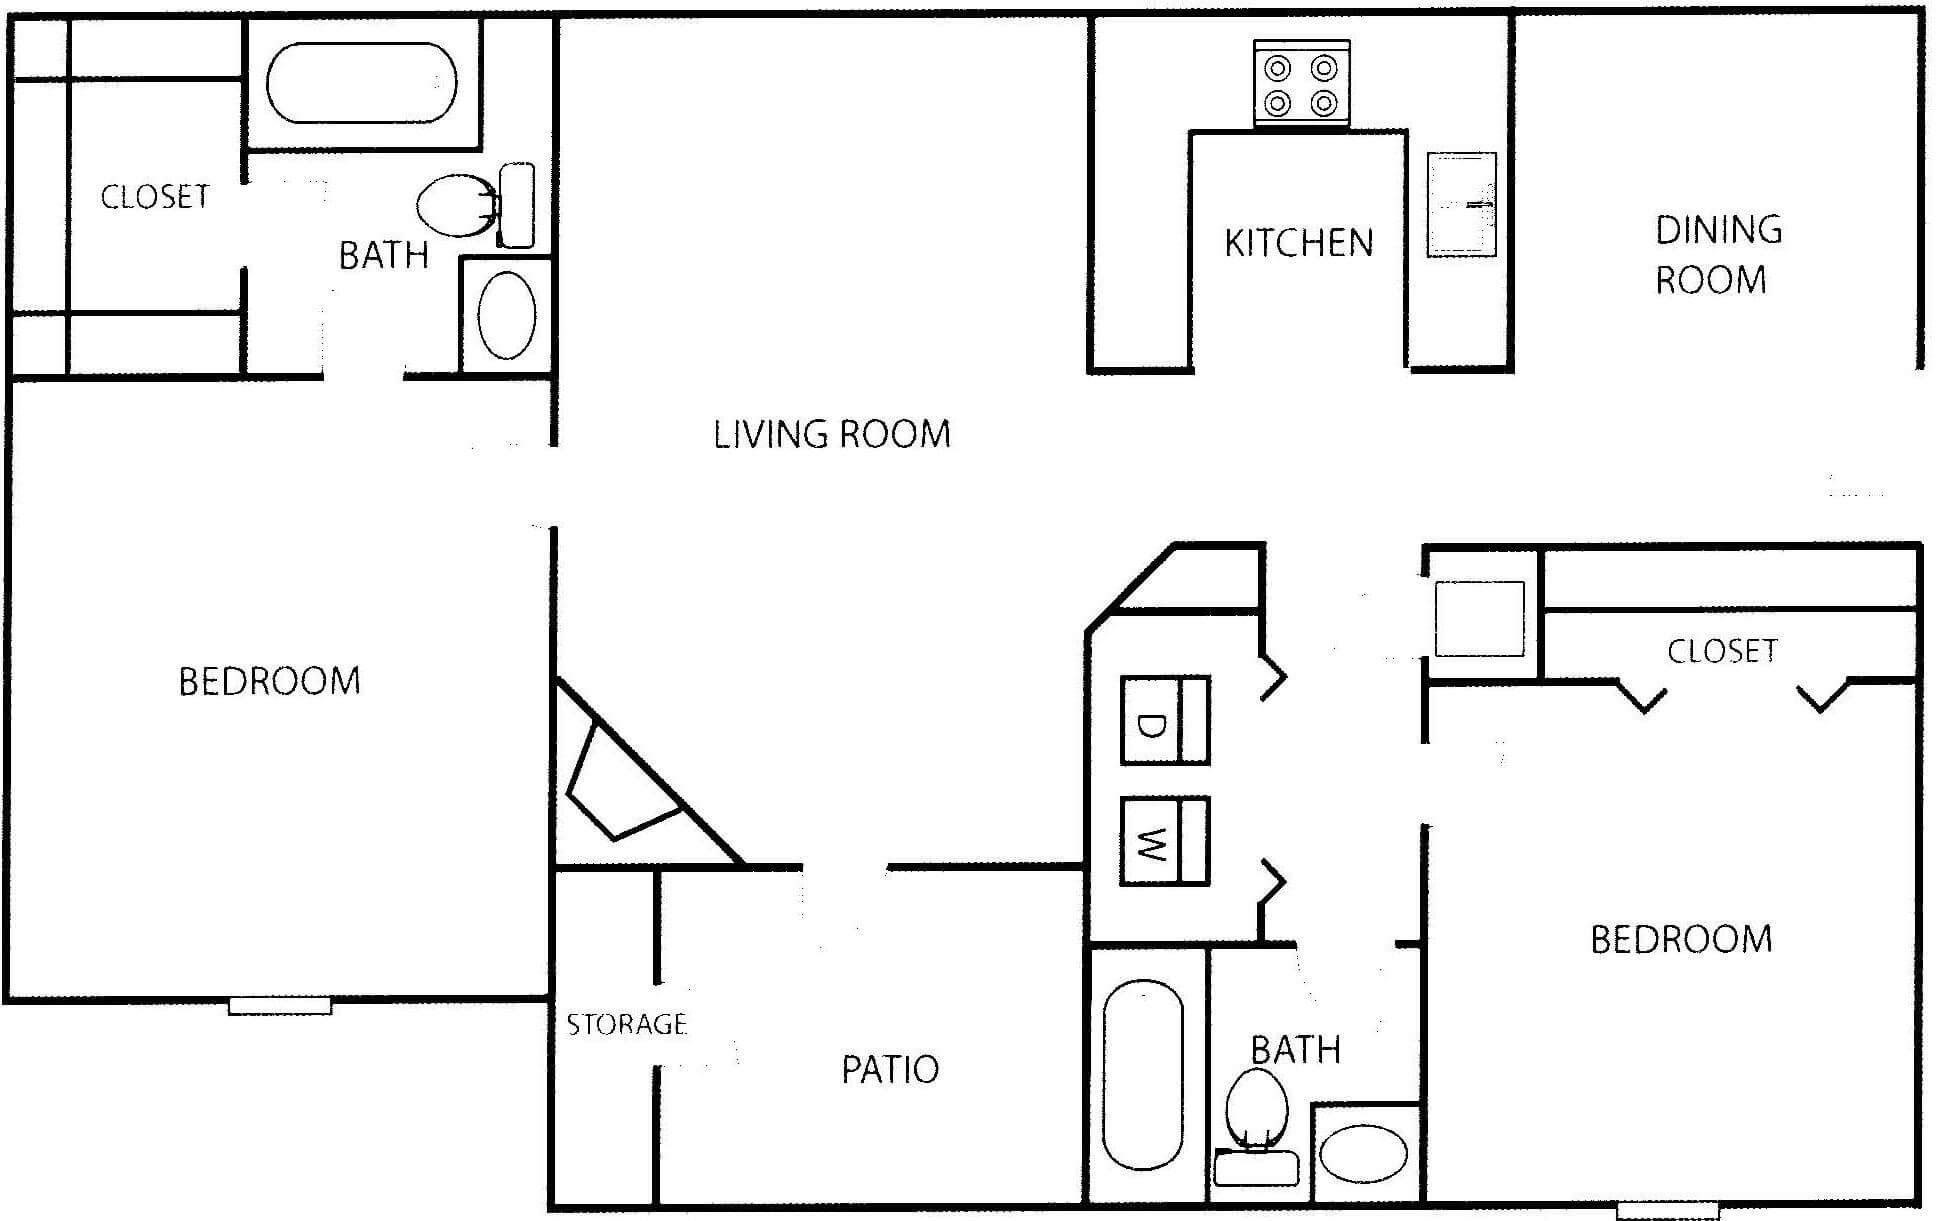 Bridlewood Apartment Homes 1150 Sigman Road NE Conyers GA